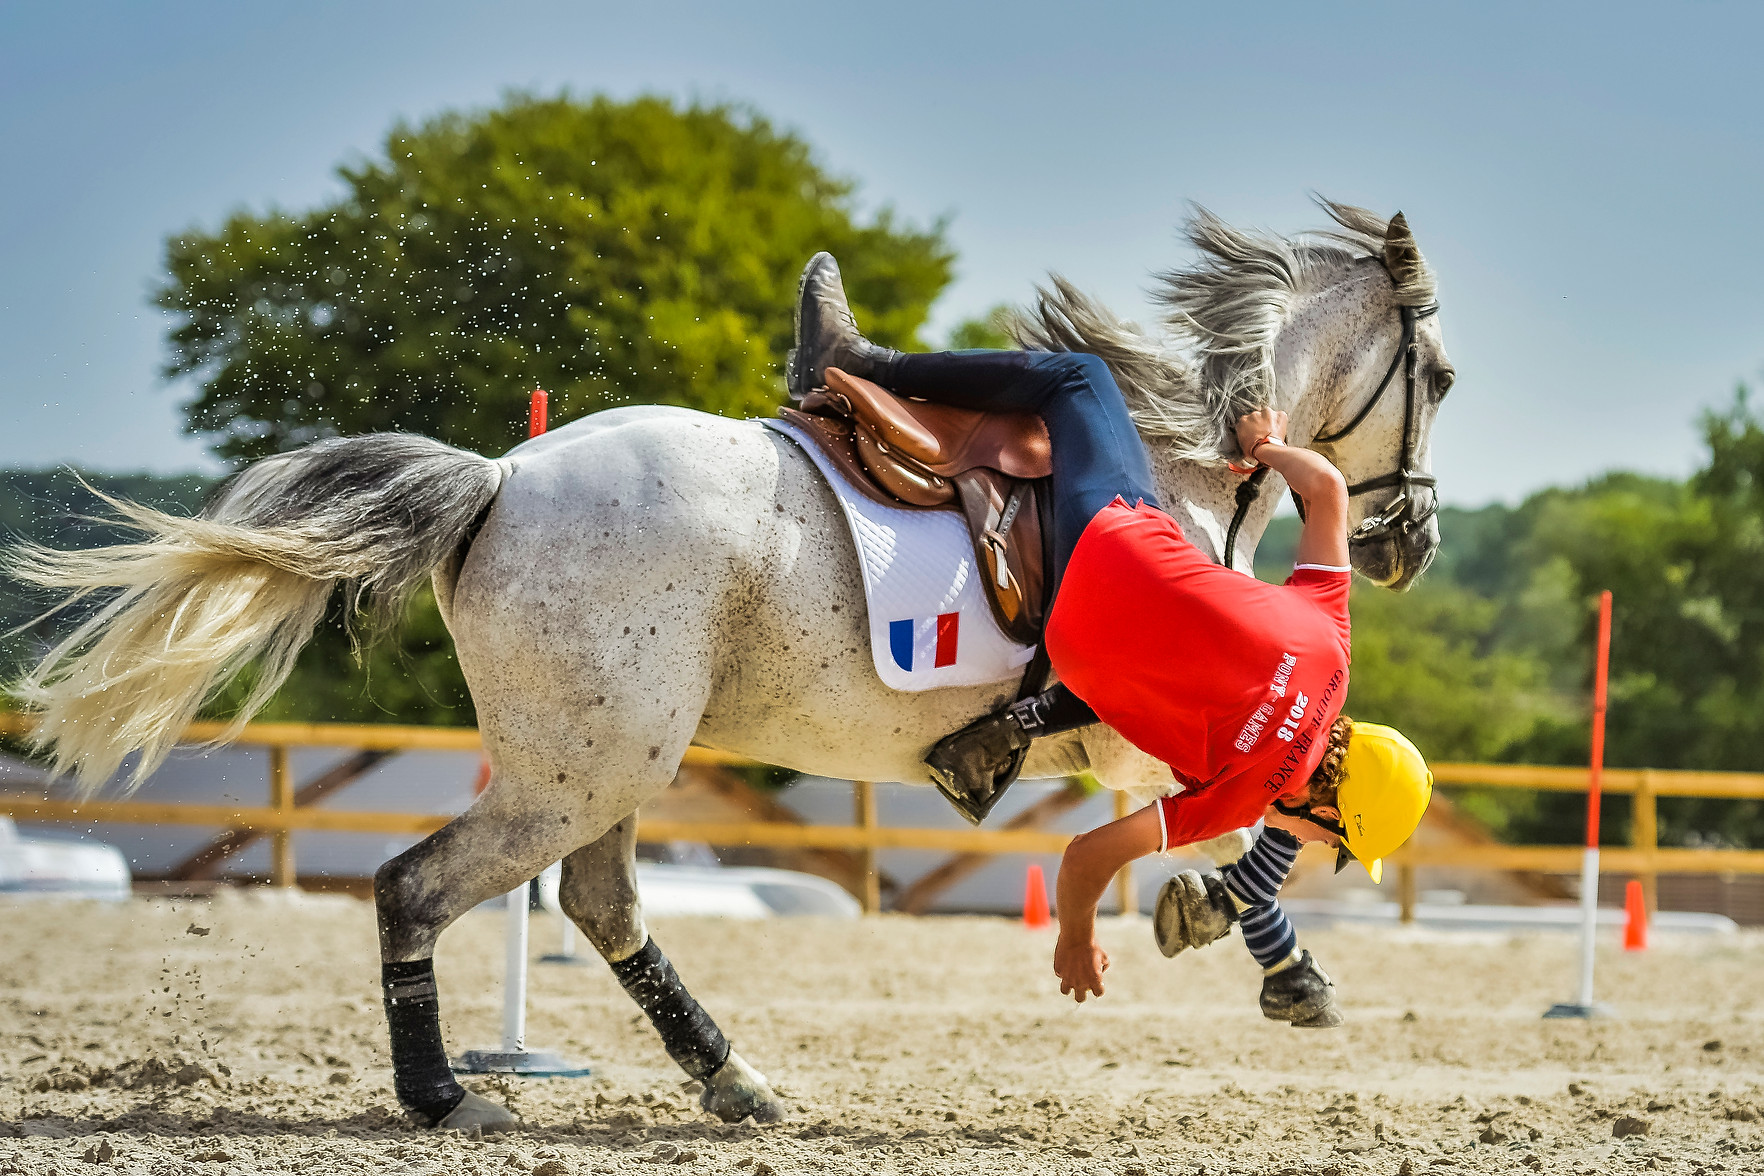 Cheval poney mounted games sporthorse pony mounted games ponygames équtation Natural Art Shot naturalartshot